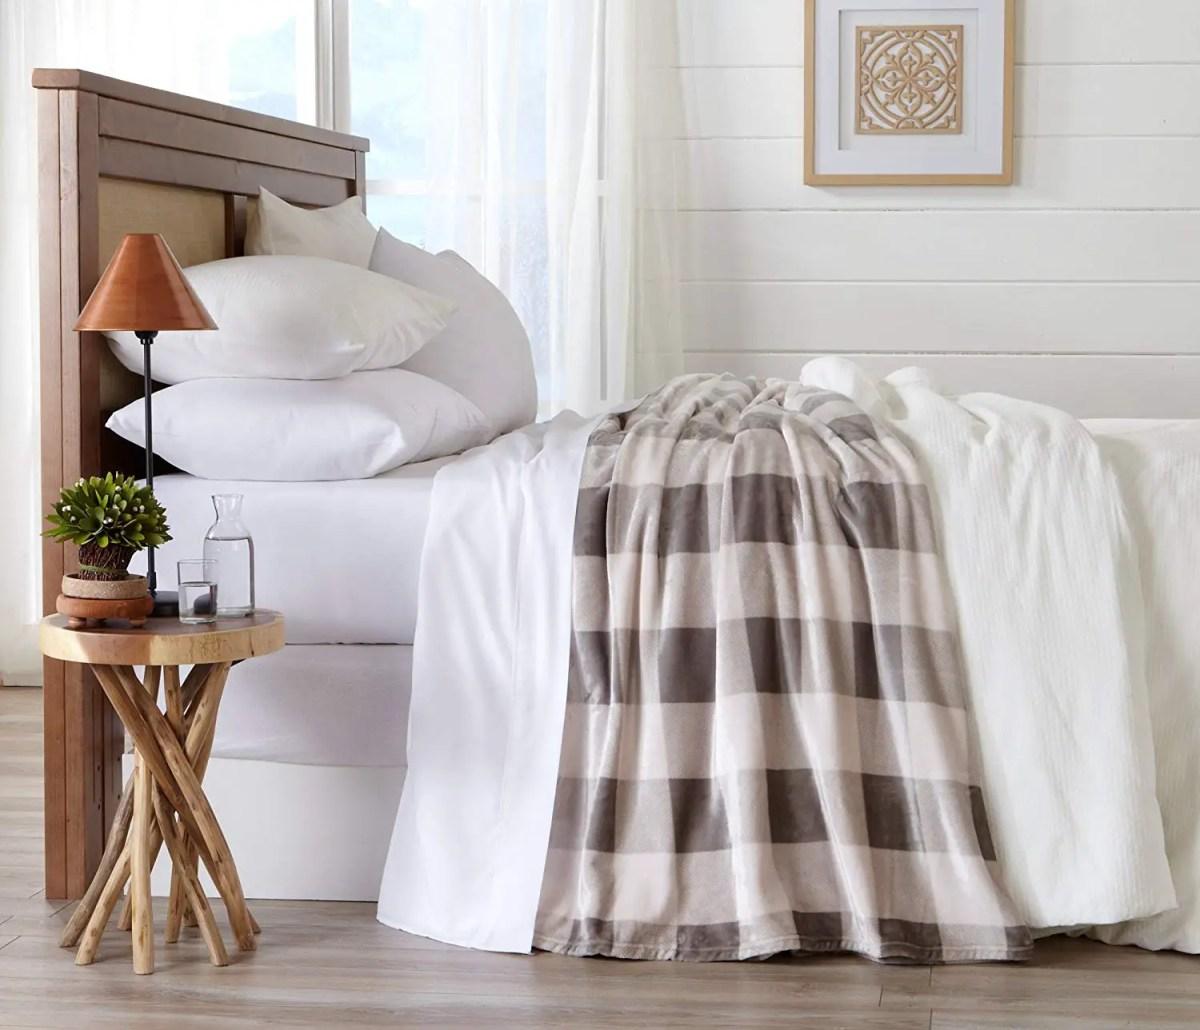 Buffalo Check: Black & White Year-Round Home Decor Ideas